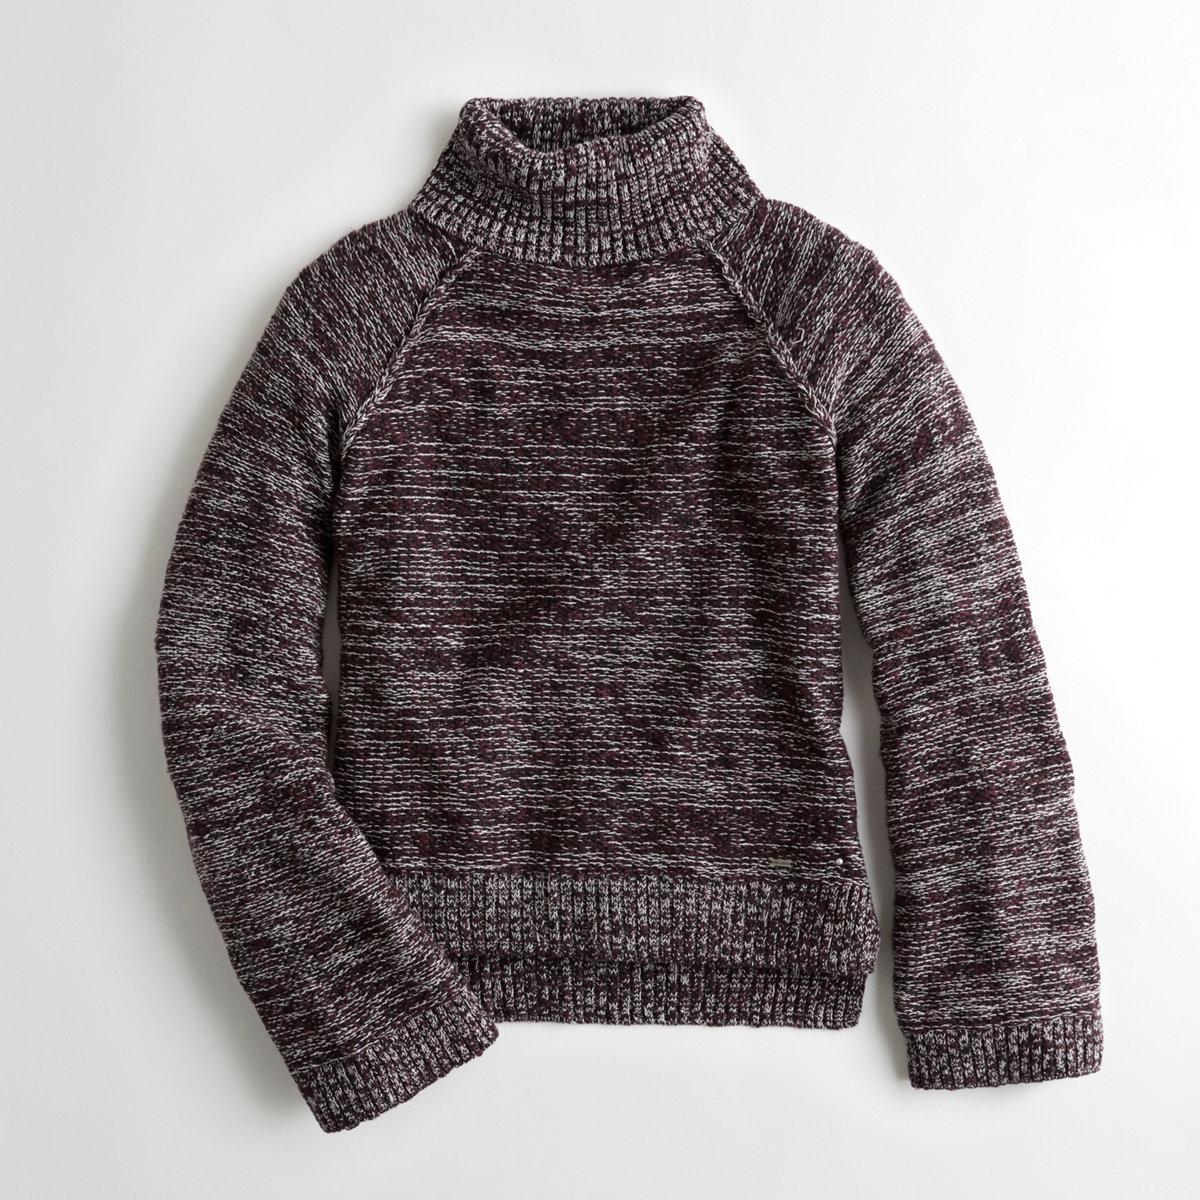 Bell-Sleeve Turtleneck Sweater